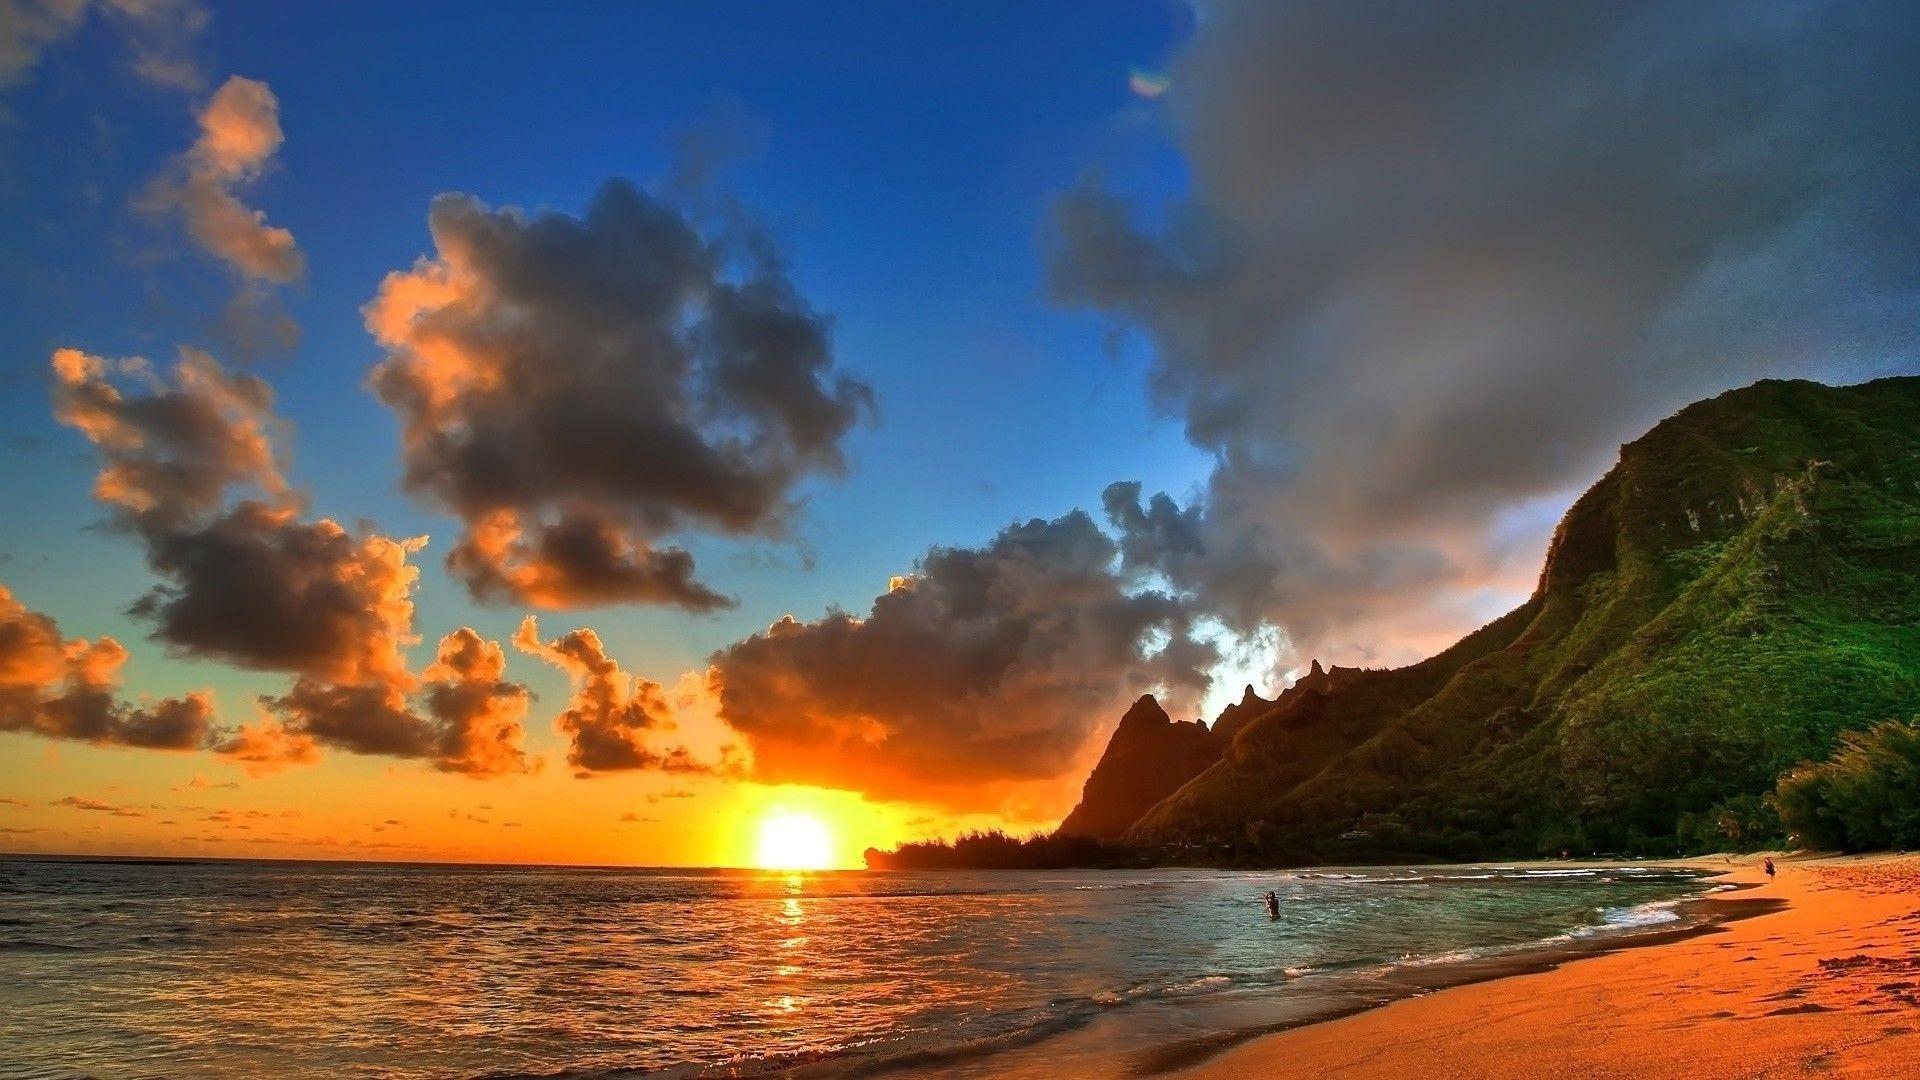 35 desktop backgrounds beach download free beautiful for Sfondi 1920x1080